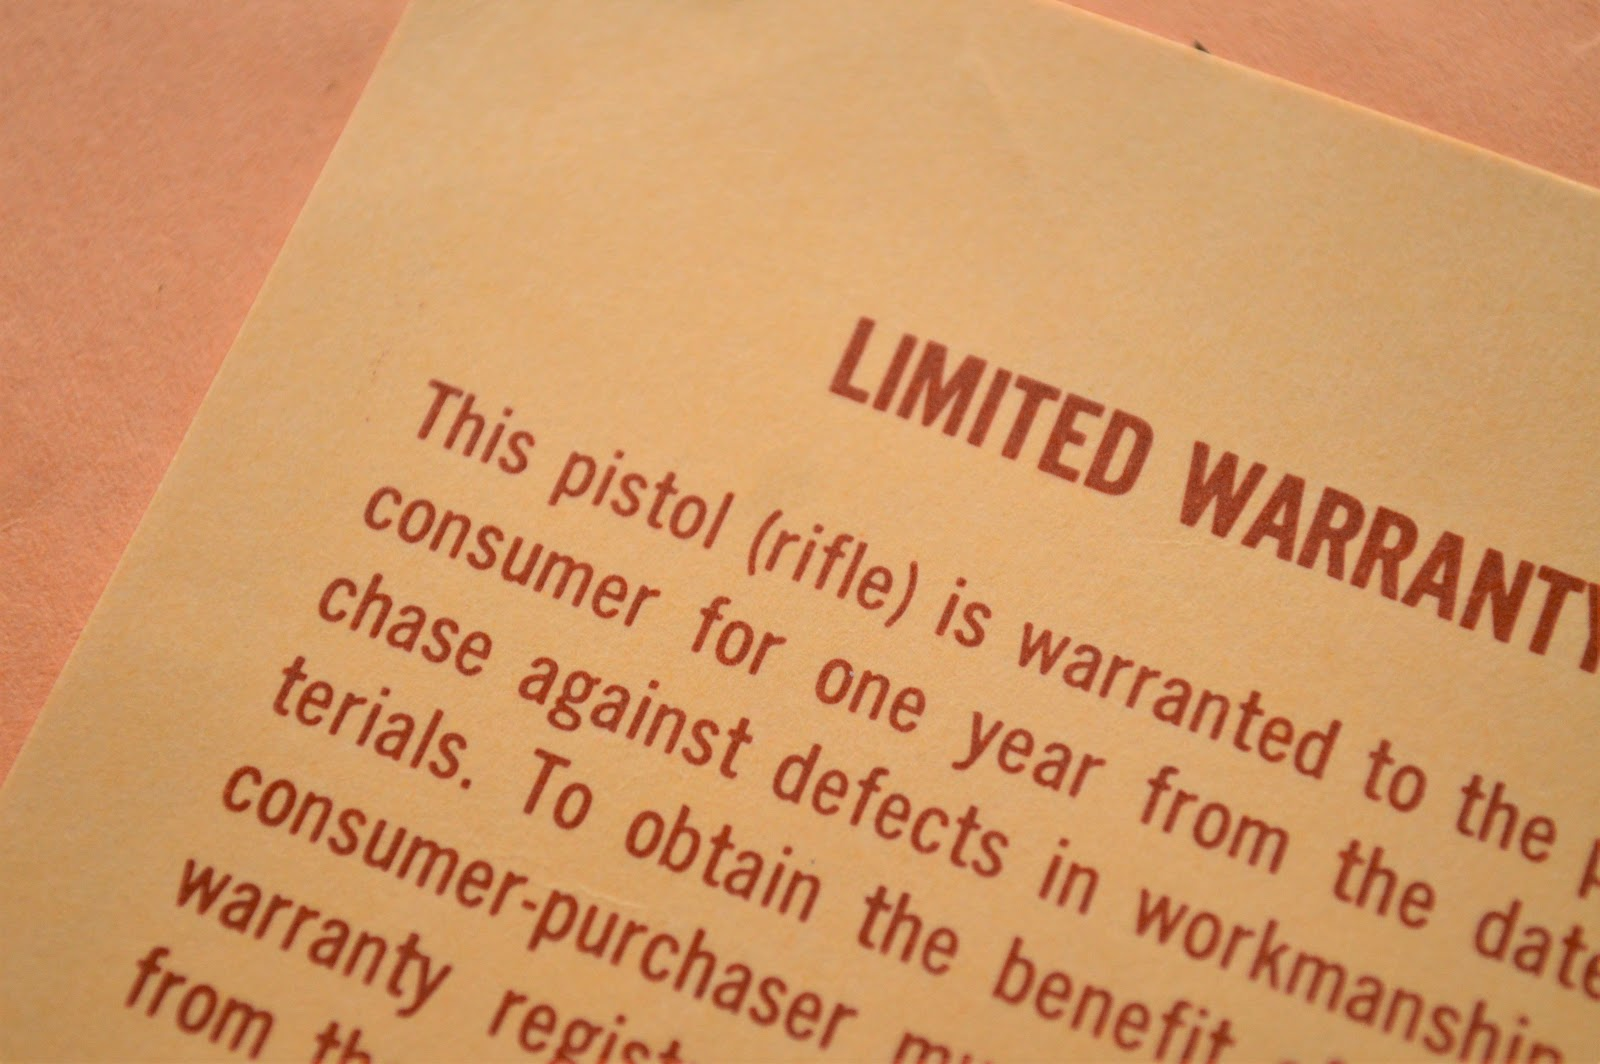 Limited Warranty on paper